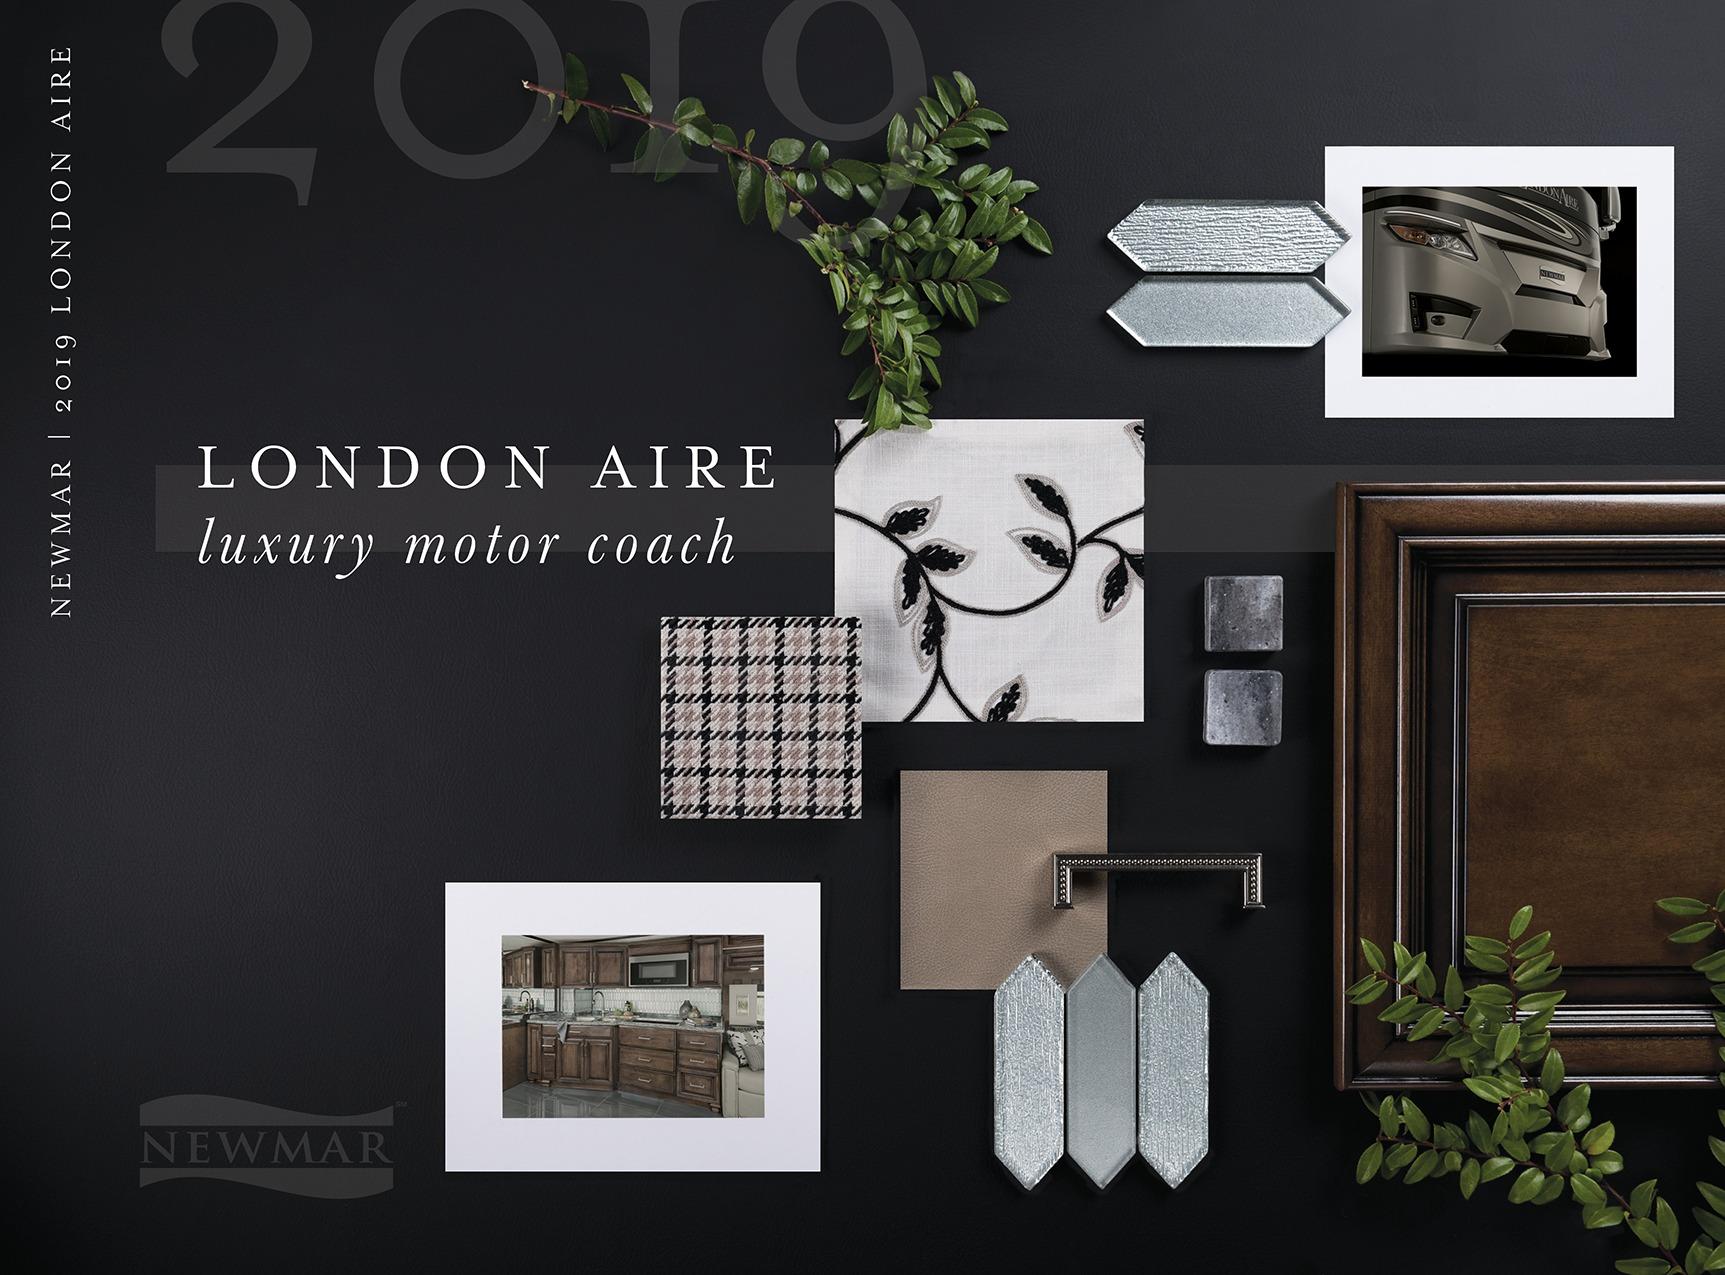 London Aire